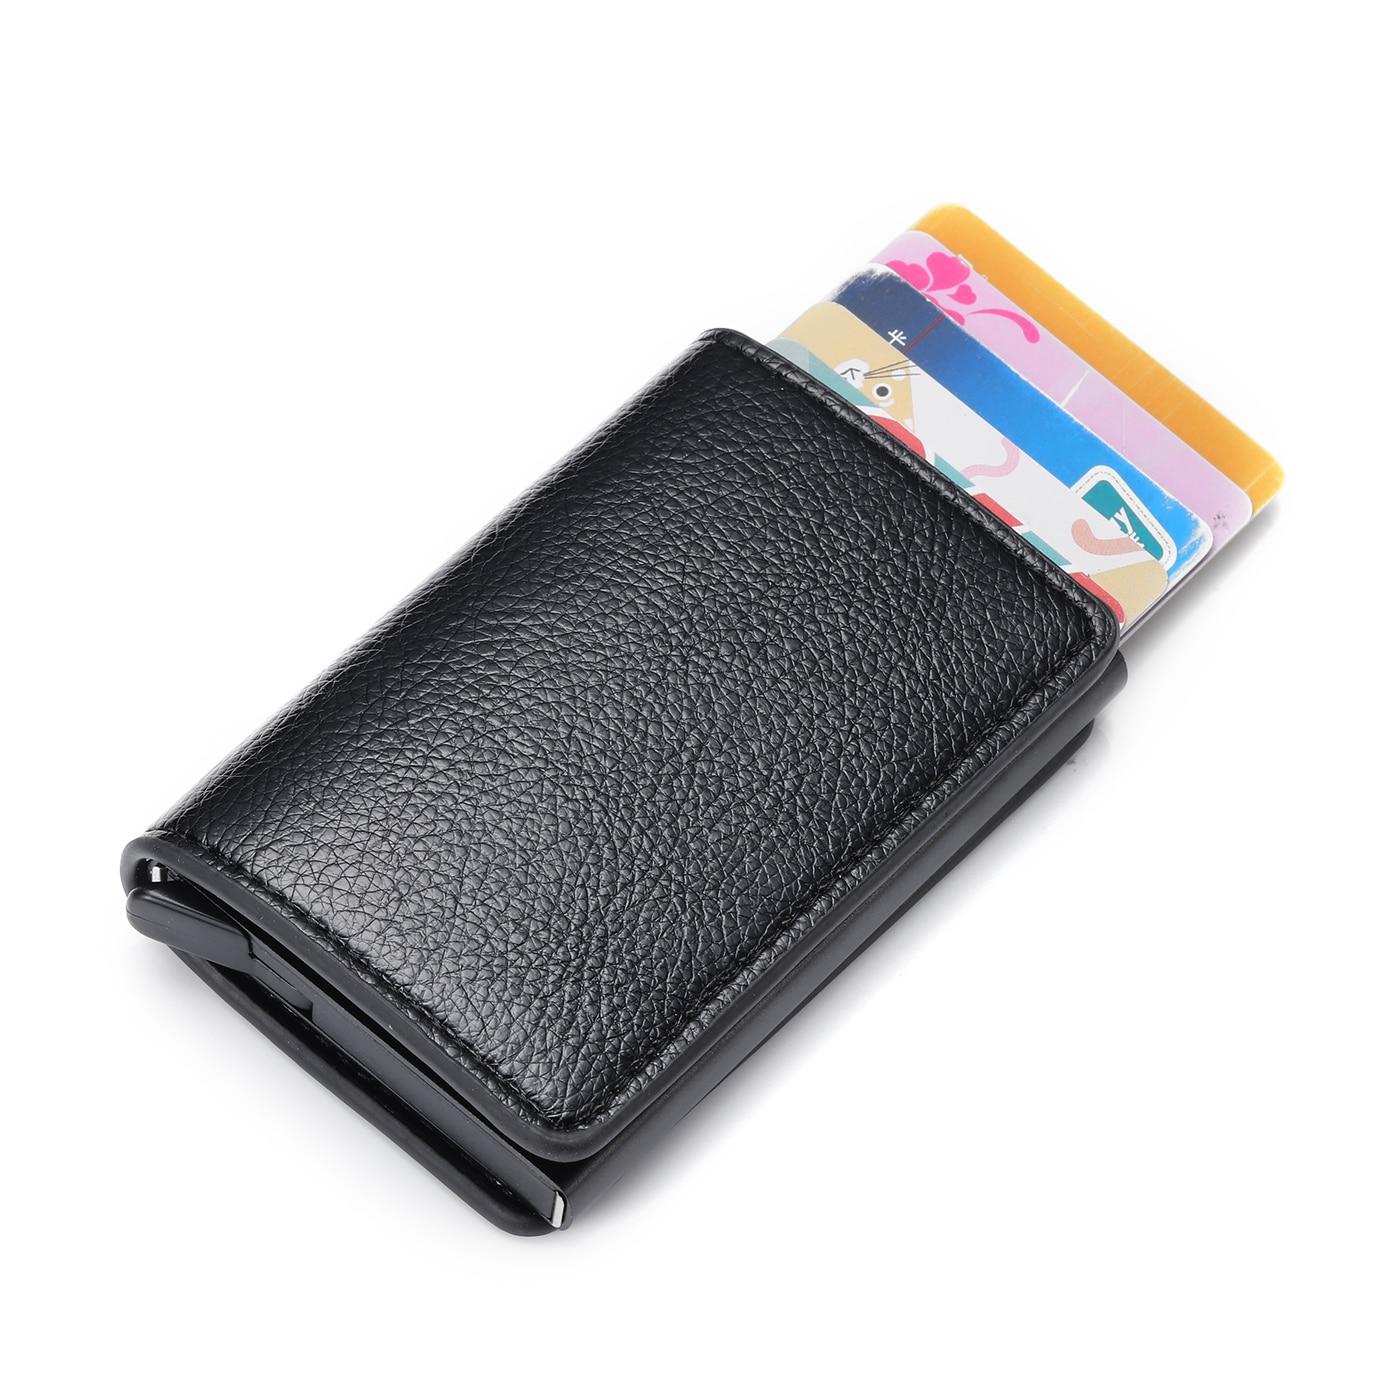 BISI GORO Minimalist Mini Wallet Men Credit Card Holders Business ID Card Case Automatic RFID Card Holder Aluminium Dropshipping